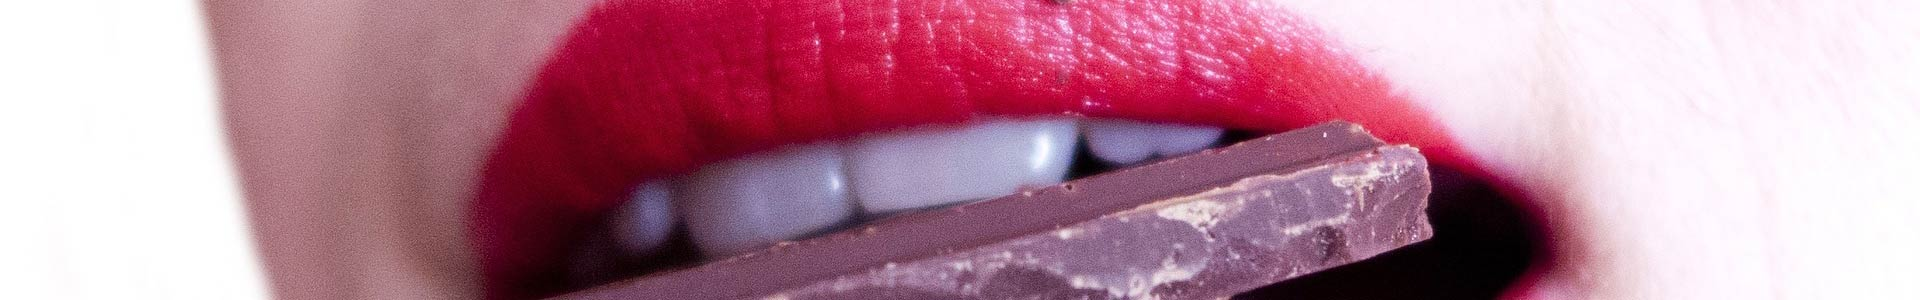 Zahn-Schokolade